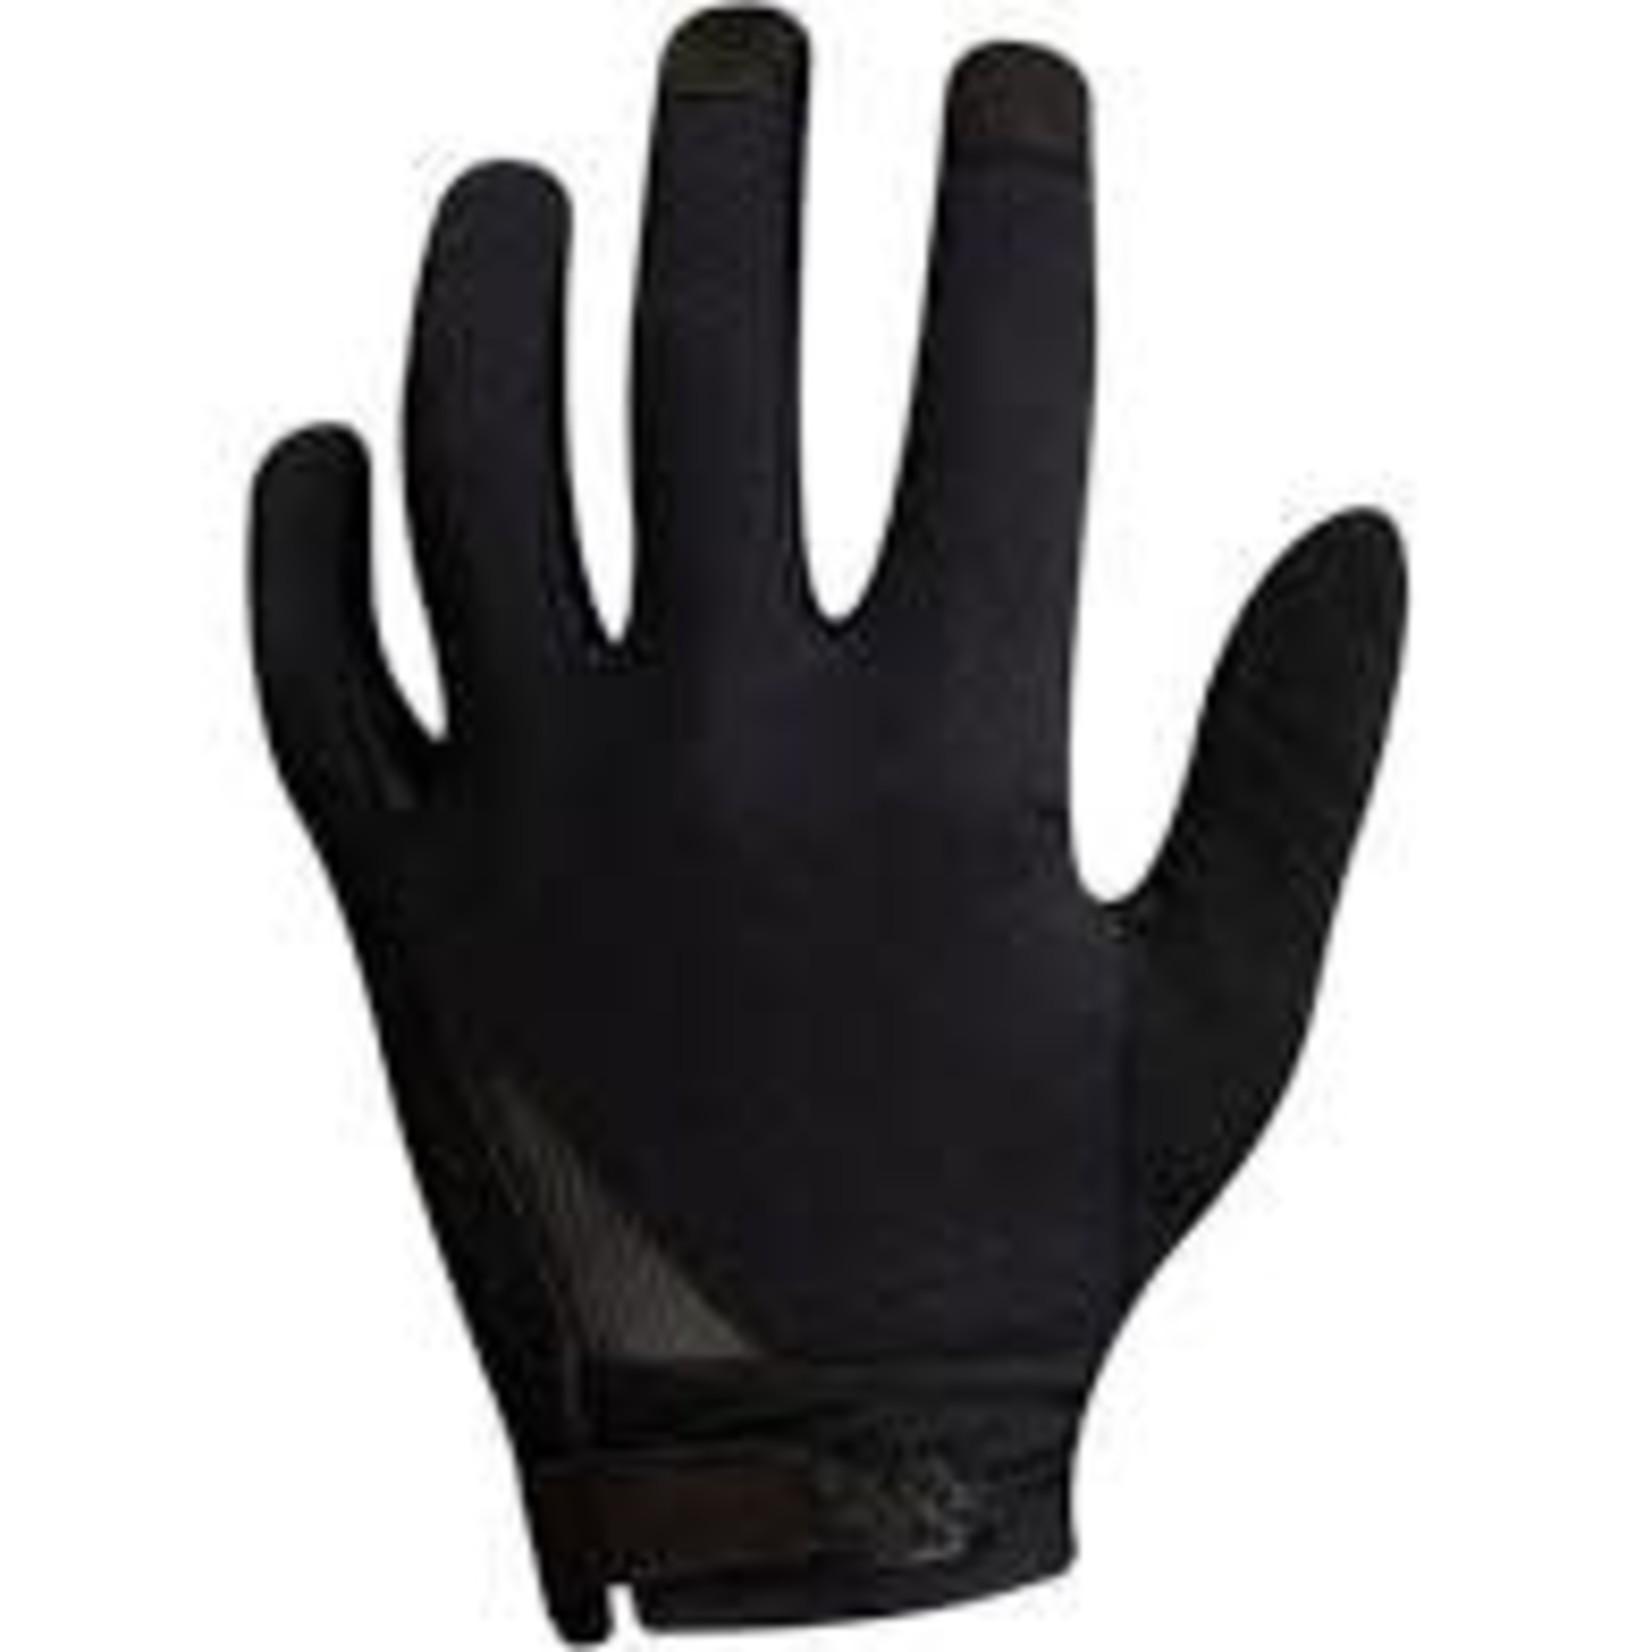 Pearl Izumi Pearl Izumi Elite Gel FF Glove MD Black